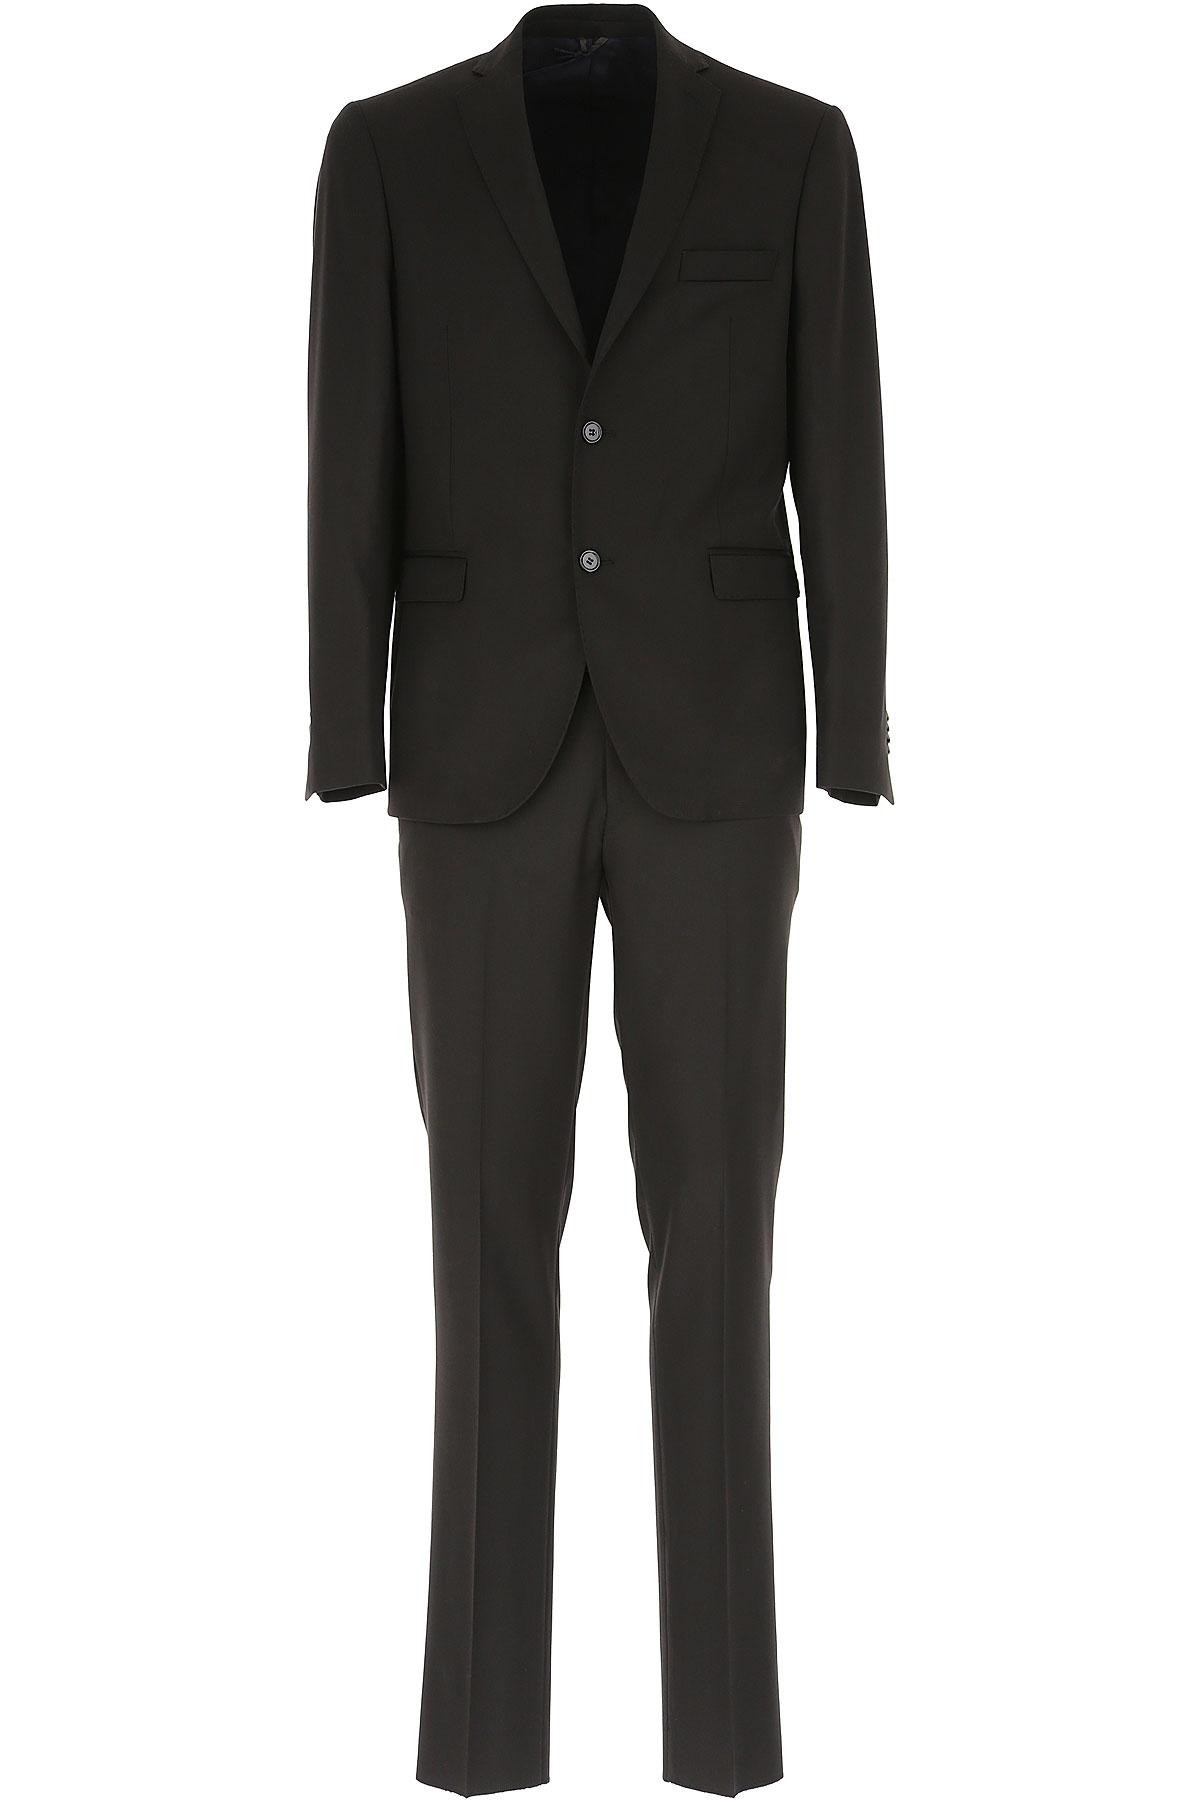 Simbols Men's Suit, Black, polyamide, 2019, L M S